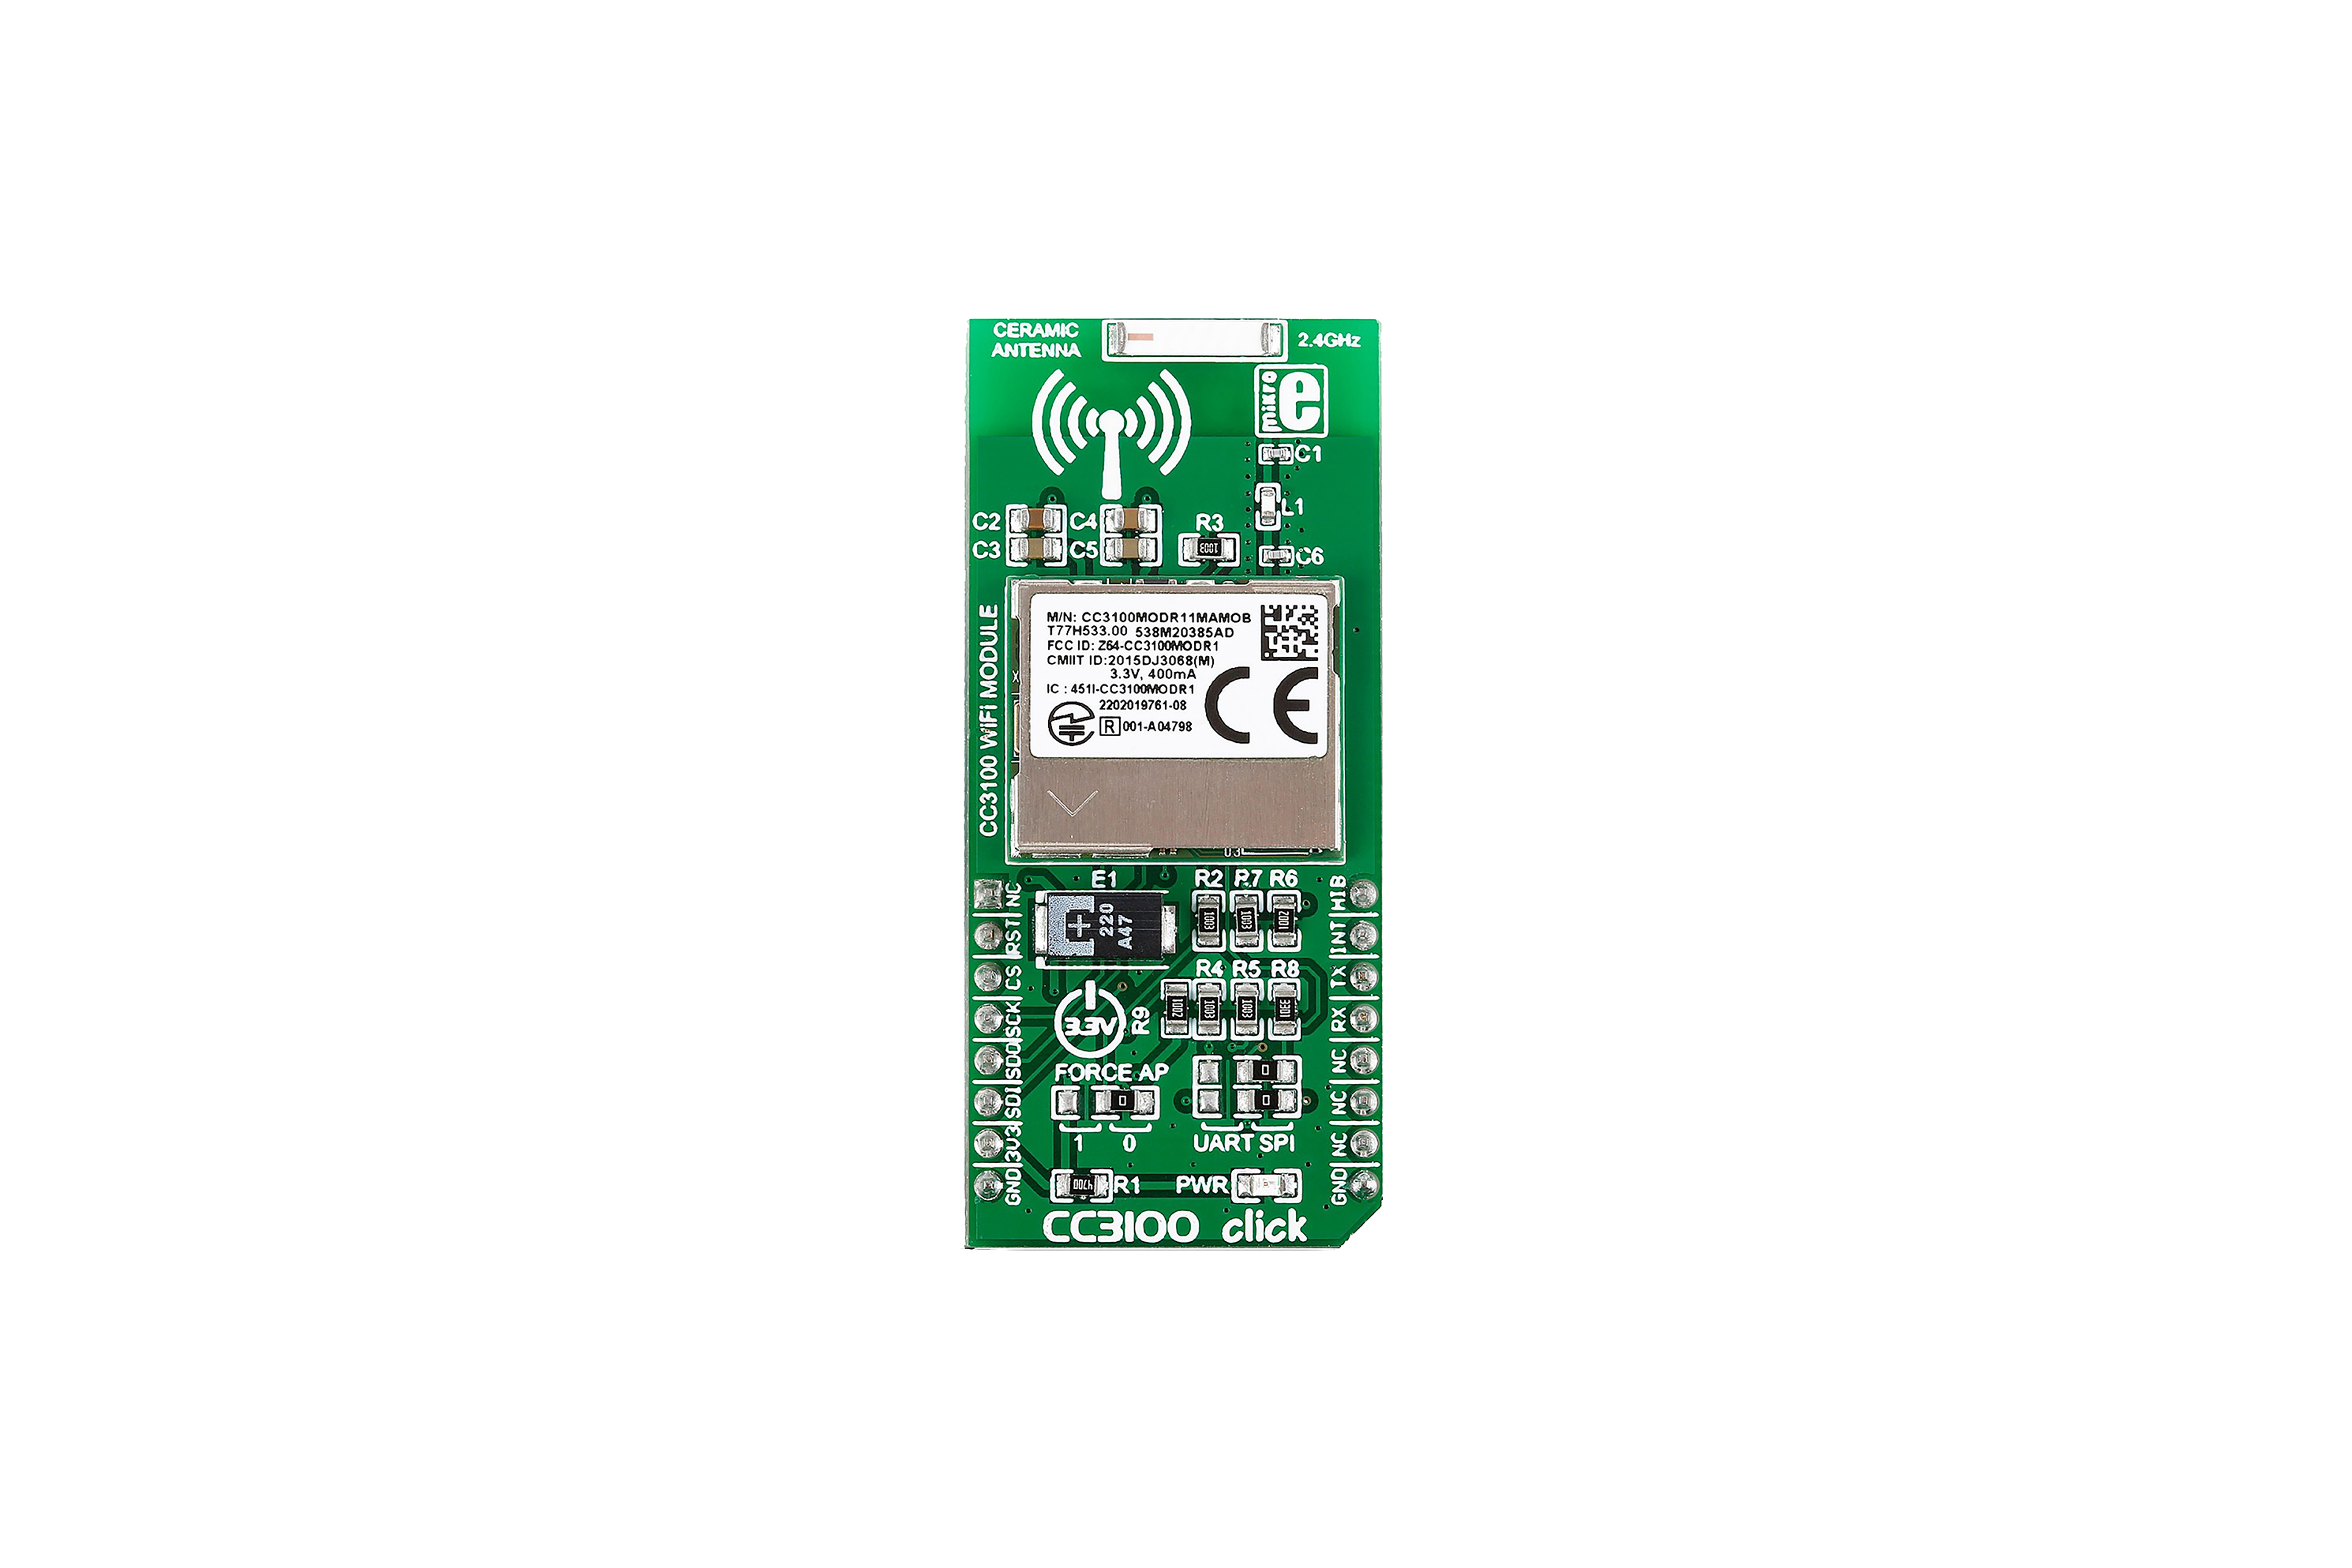 CC3100 CLIC WIFI IOT BOARD, MIKROE-2336